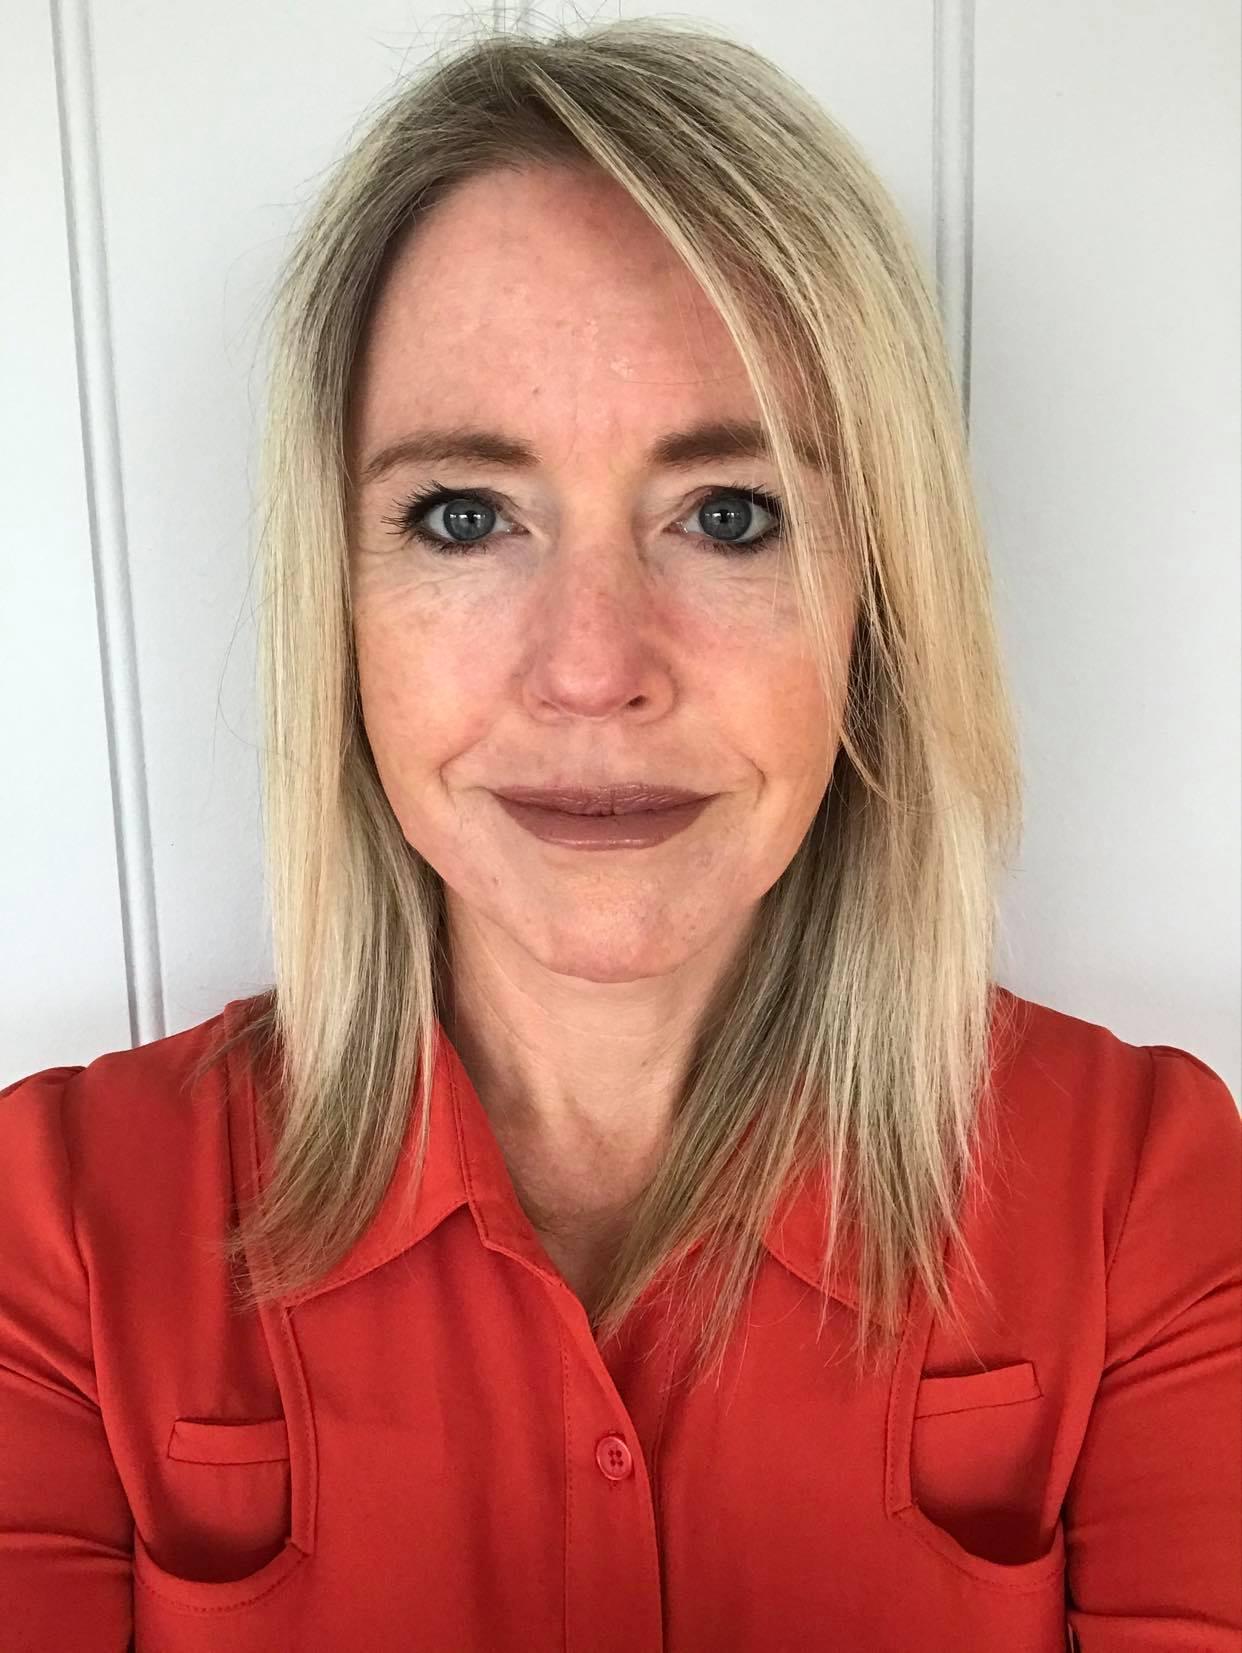 Kristin Keane